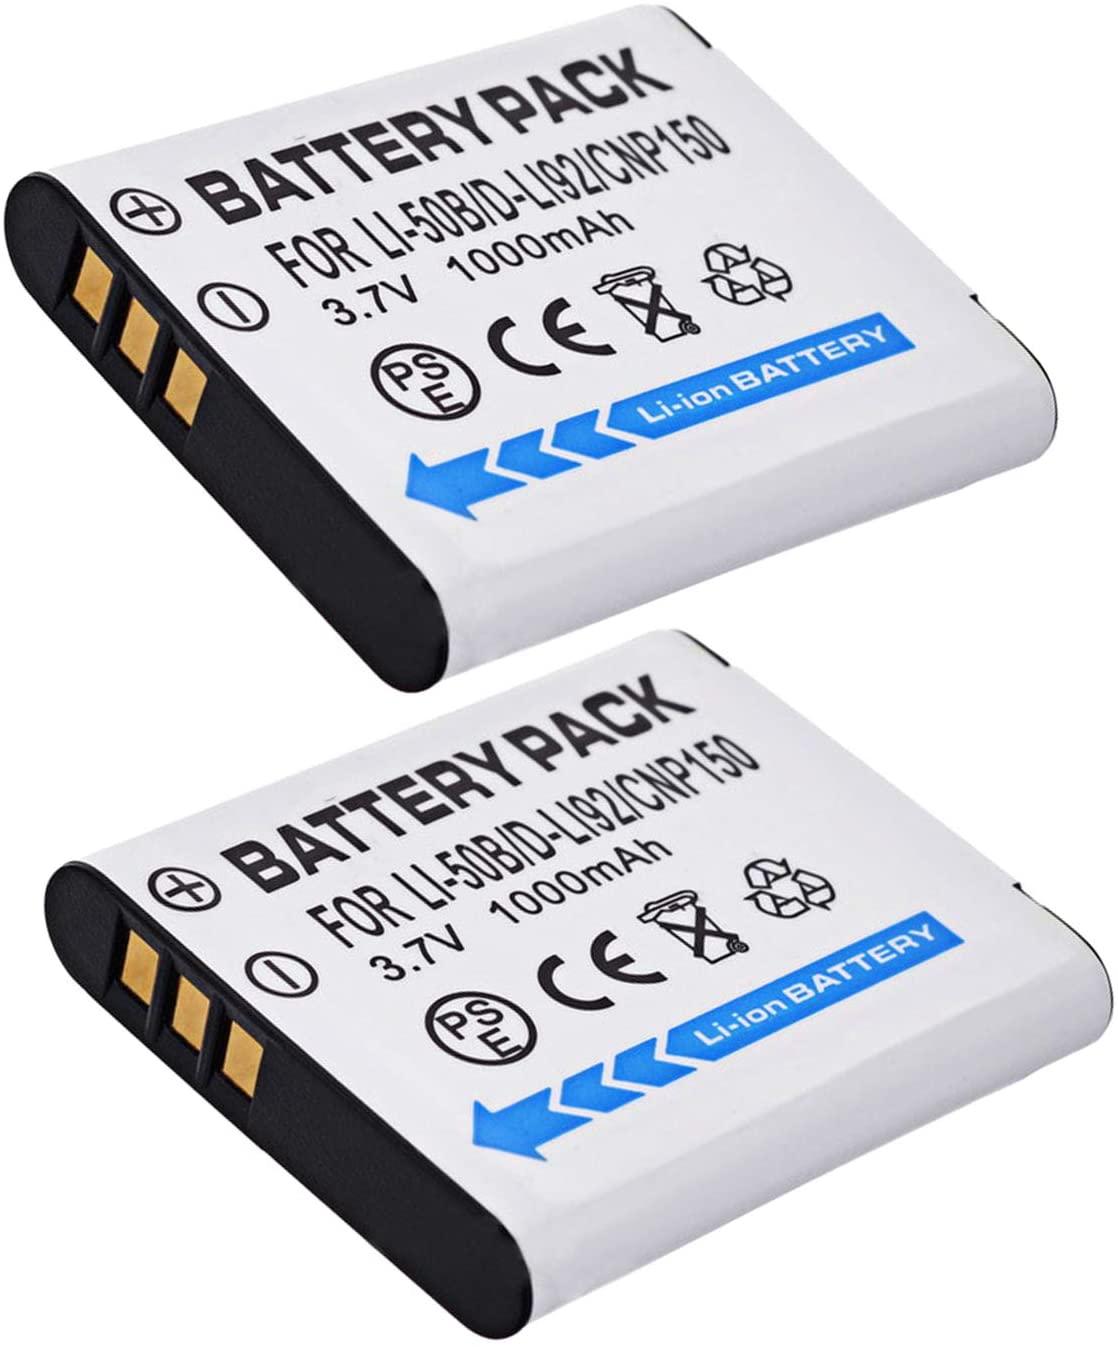 Battery 2 Pack for Ricoh WG-4 GPS, WG-5 GPS Digital Camera